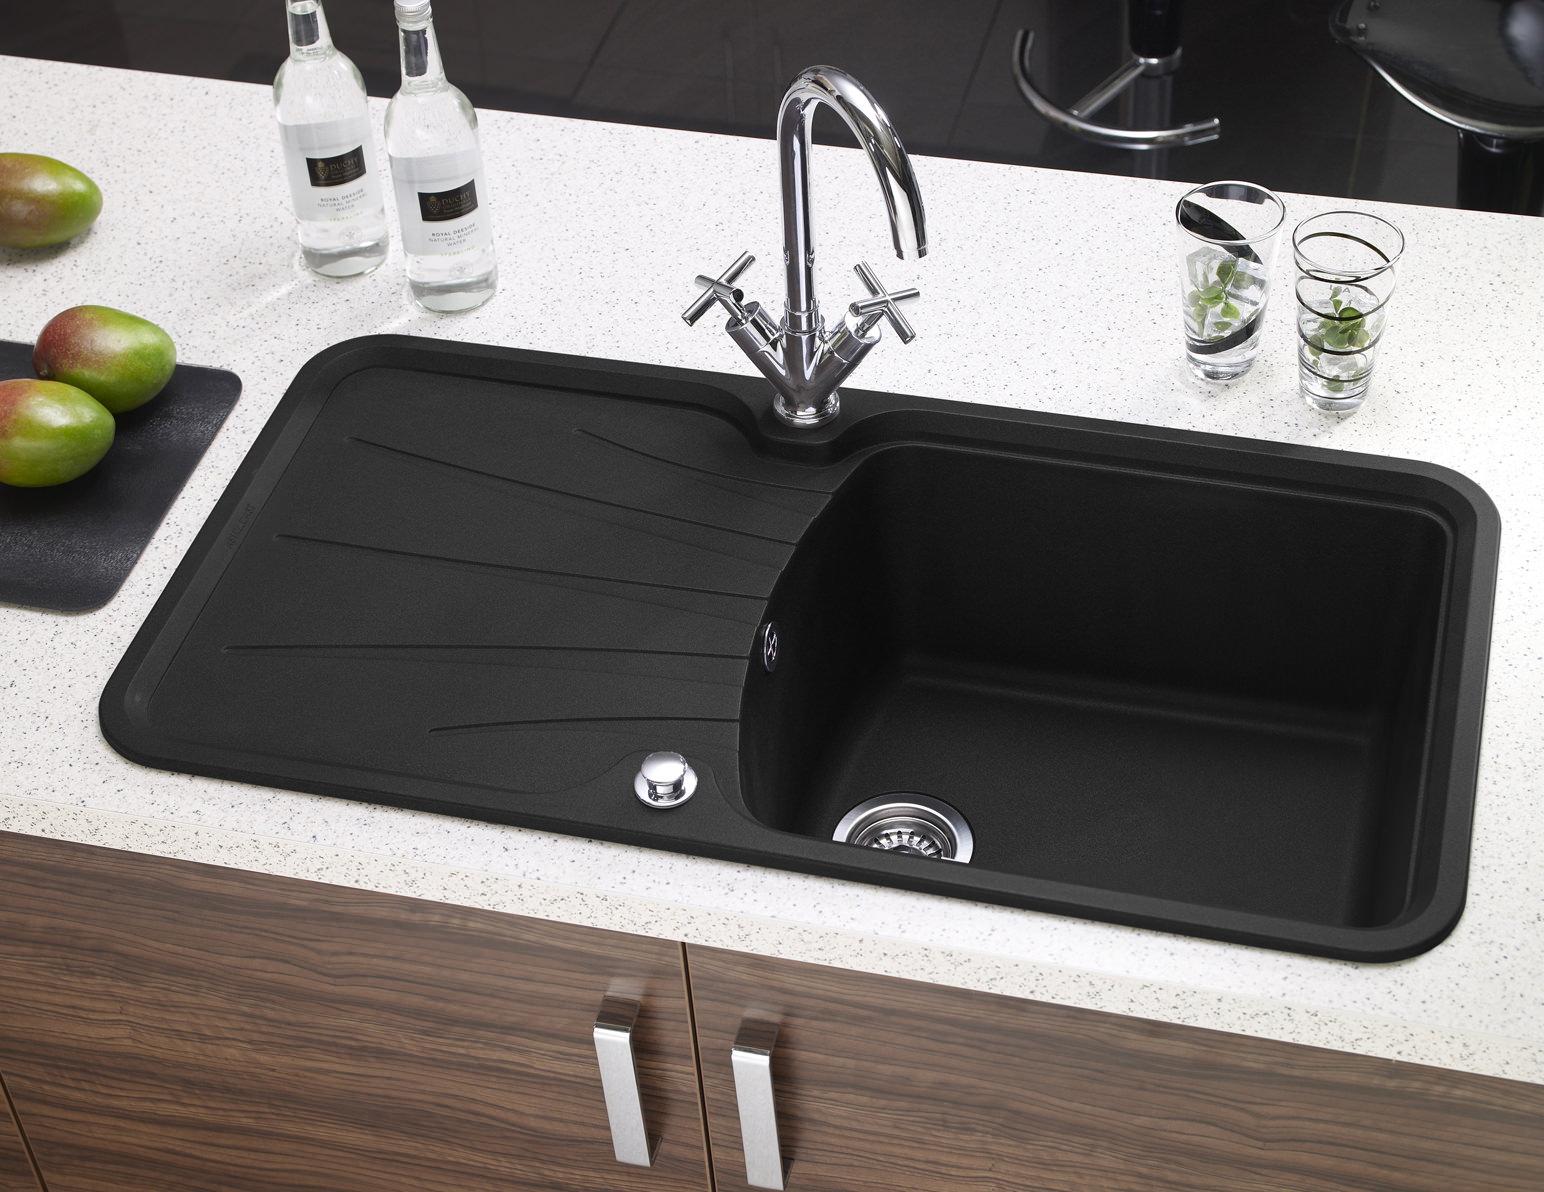 Astracast Korona Composite ROK Metallic Inset Sink - 1.0 Bowl